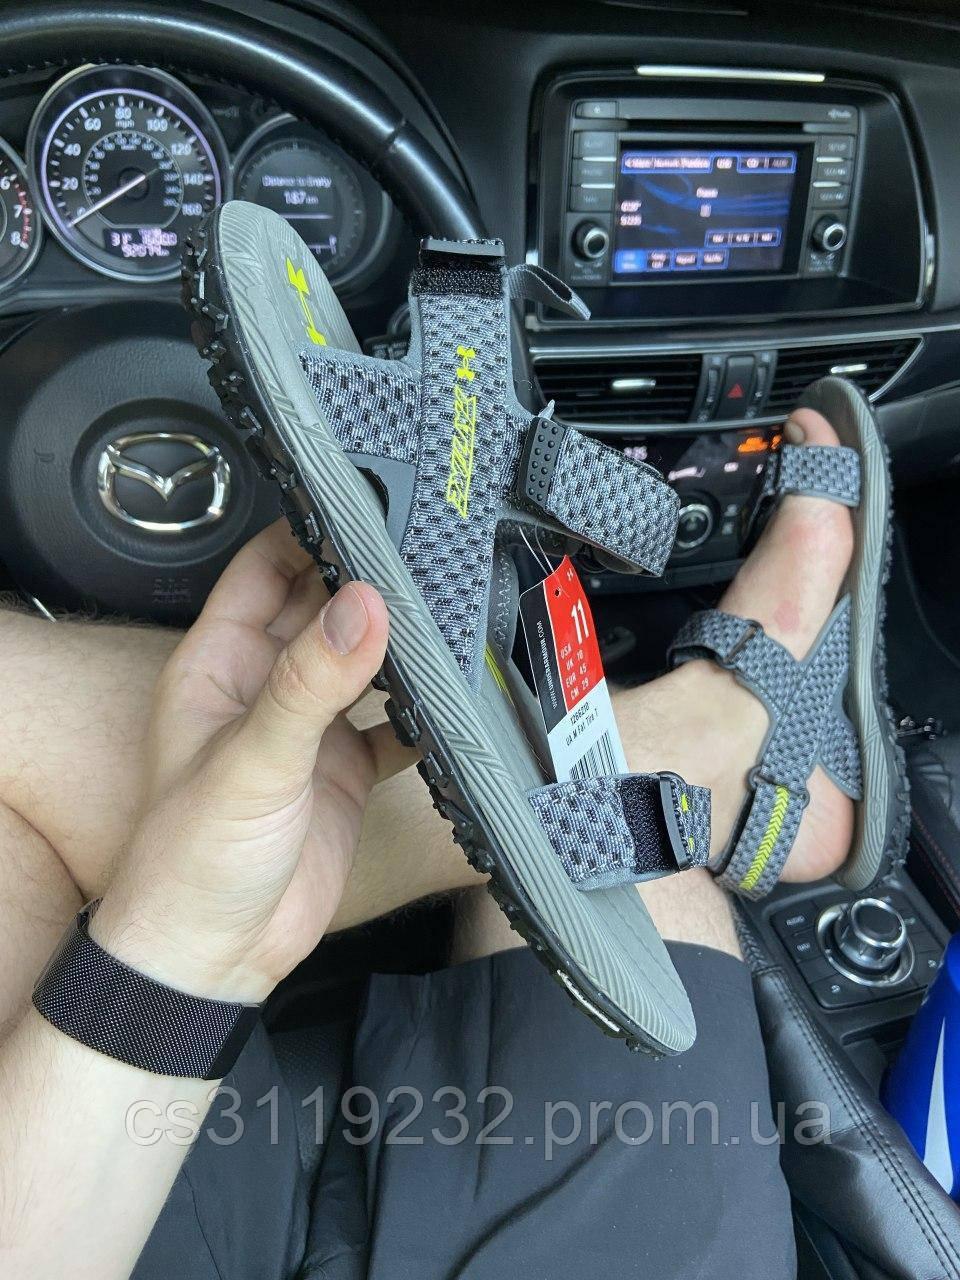 Мужские сандали Under Armour Sandals Fattire x Michelin Gray (серые)